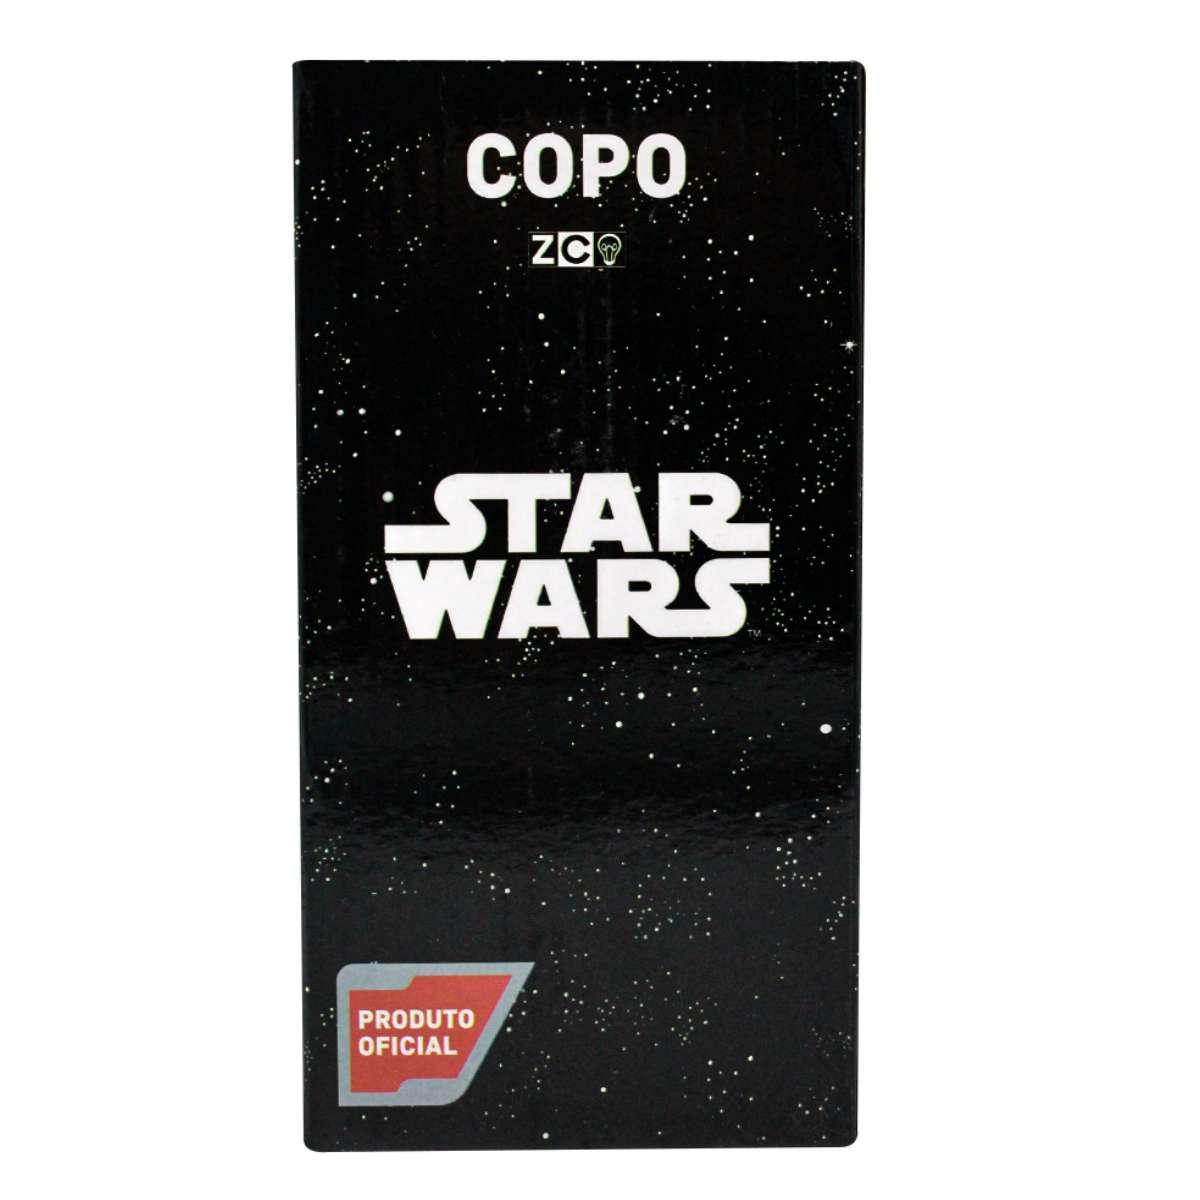 Copo Viagem Star Wars The Force A Força Jedi